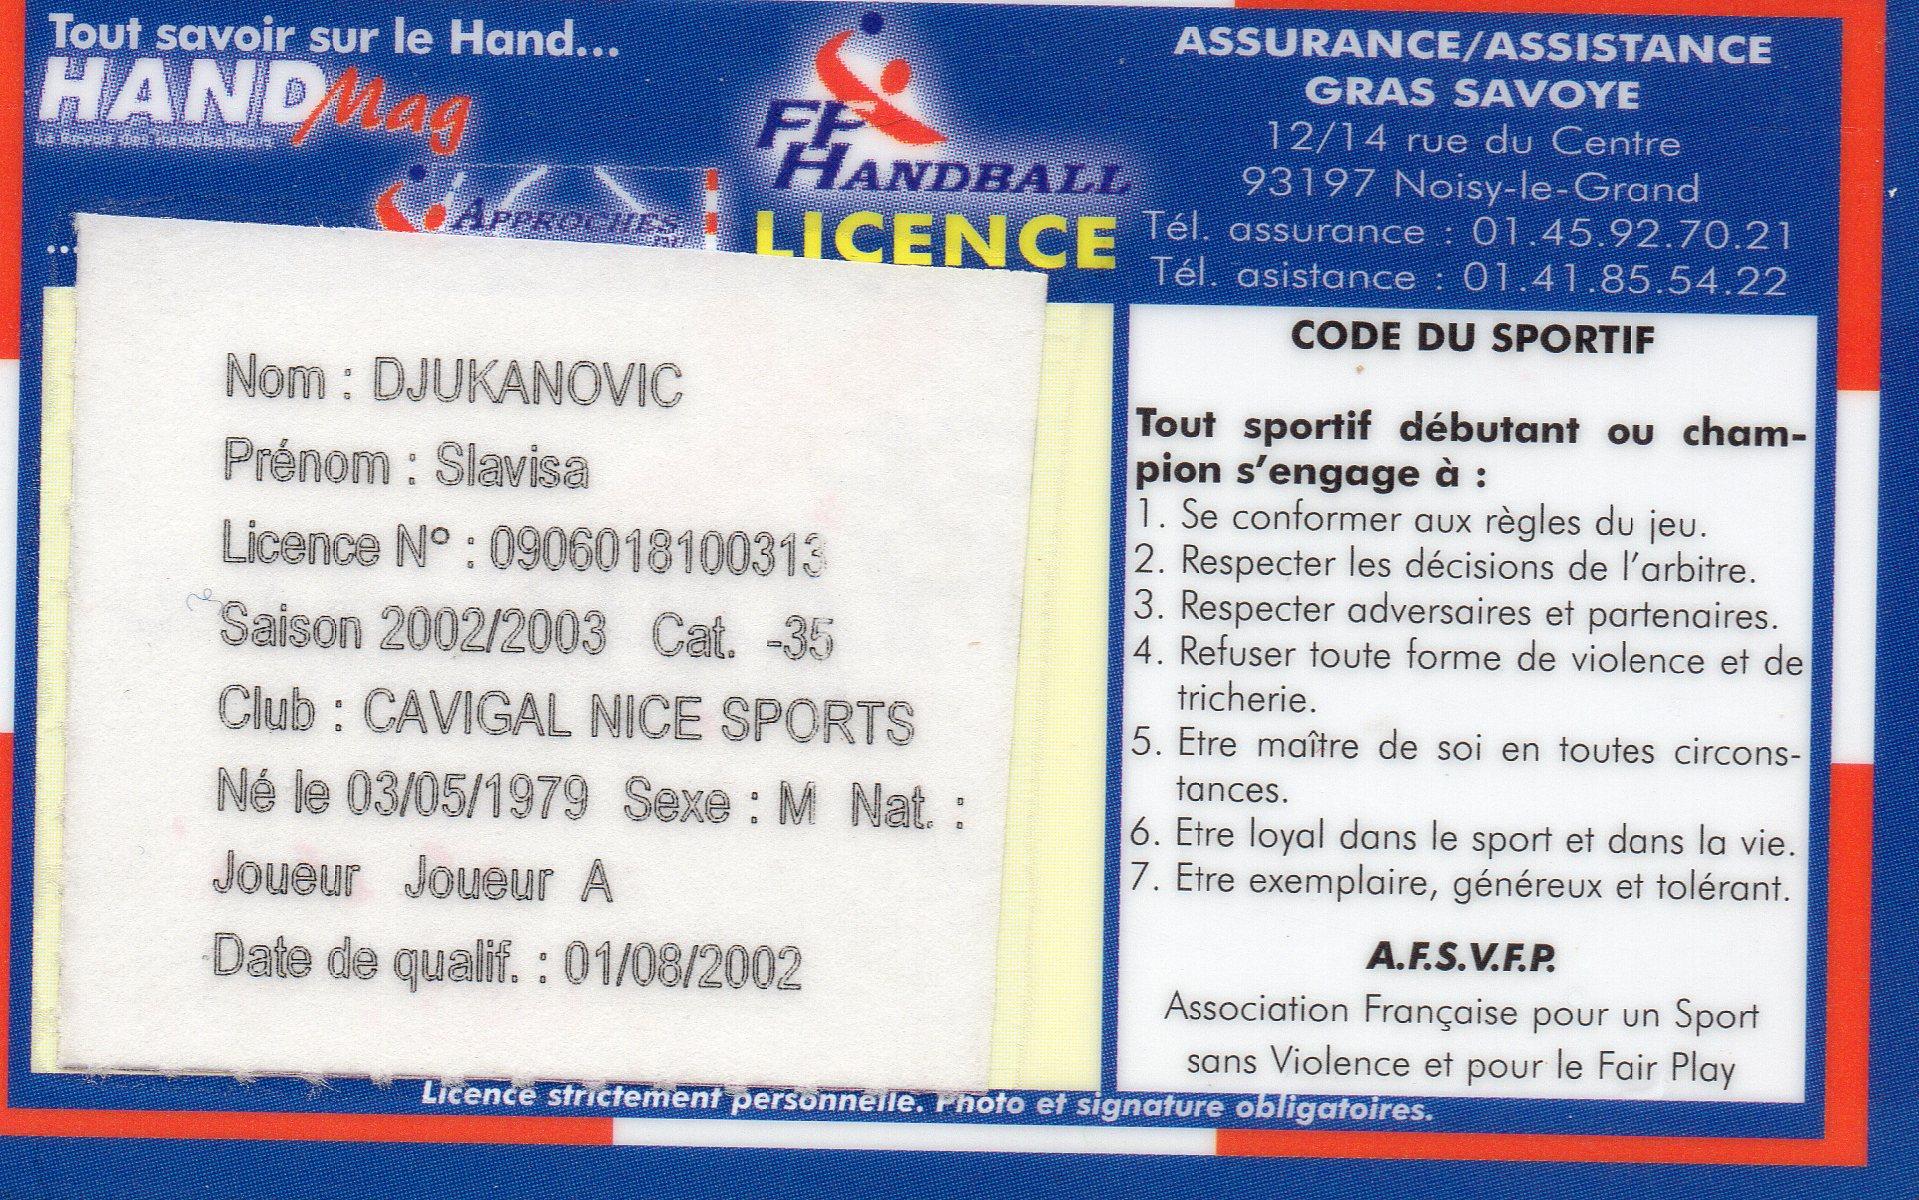 Slavisa Djukanovic | Handball Goalkeeper - Première licence française Cavigal Nice Handball le 1 août 2002